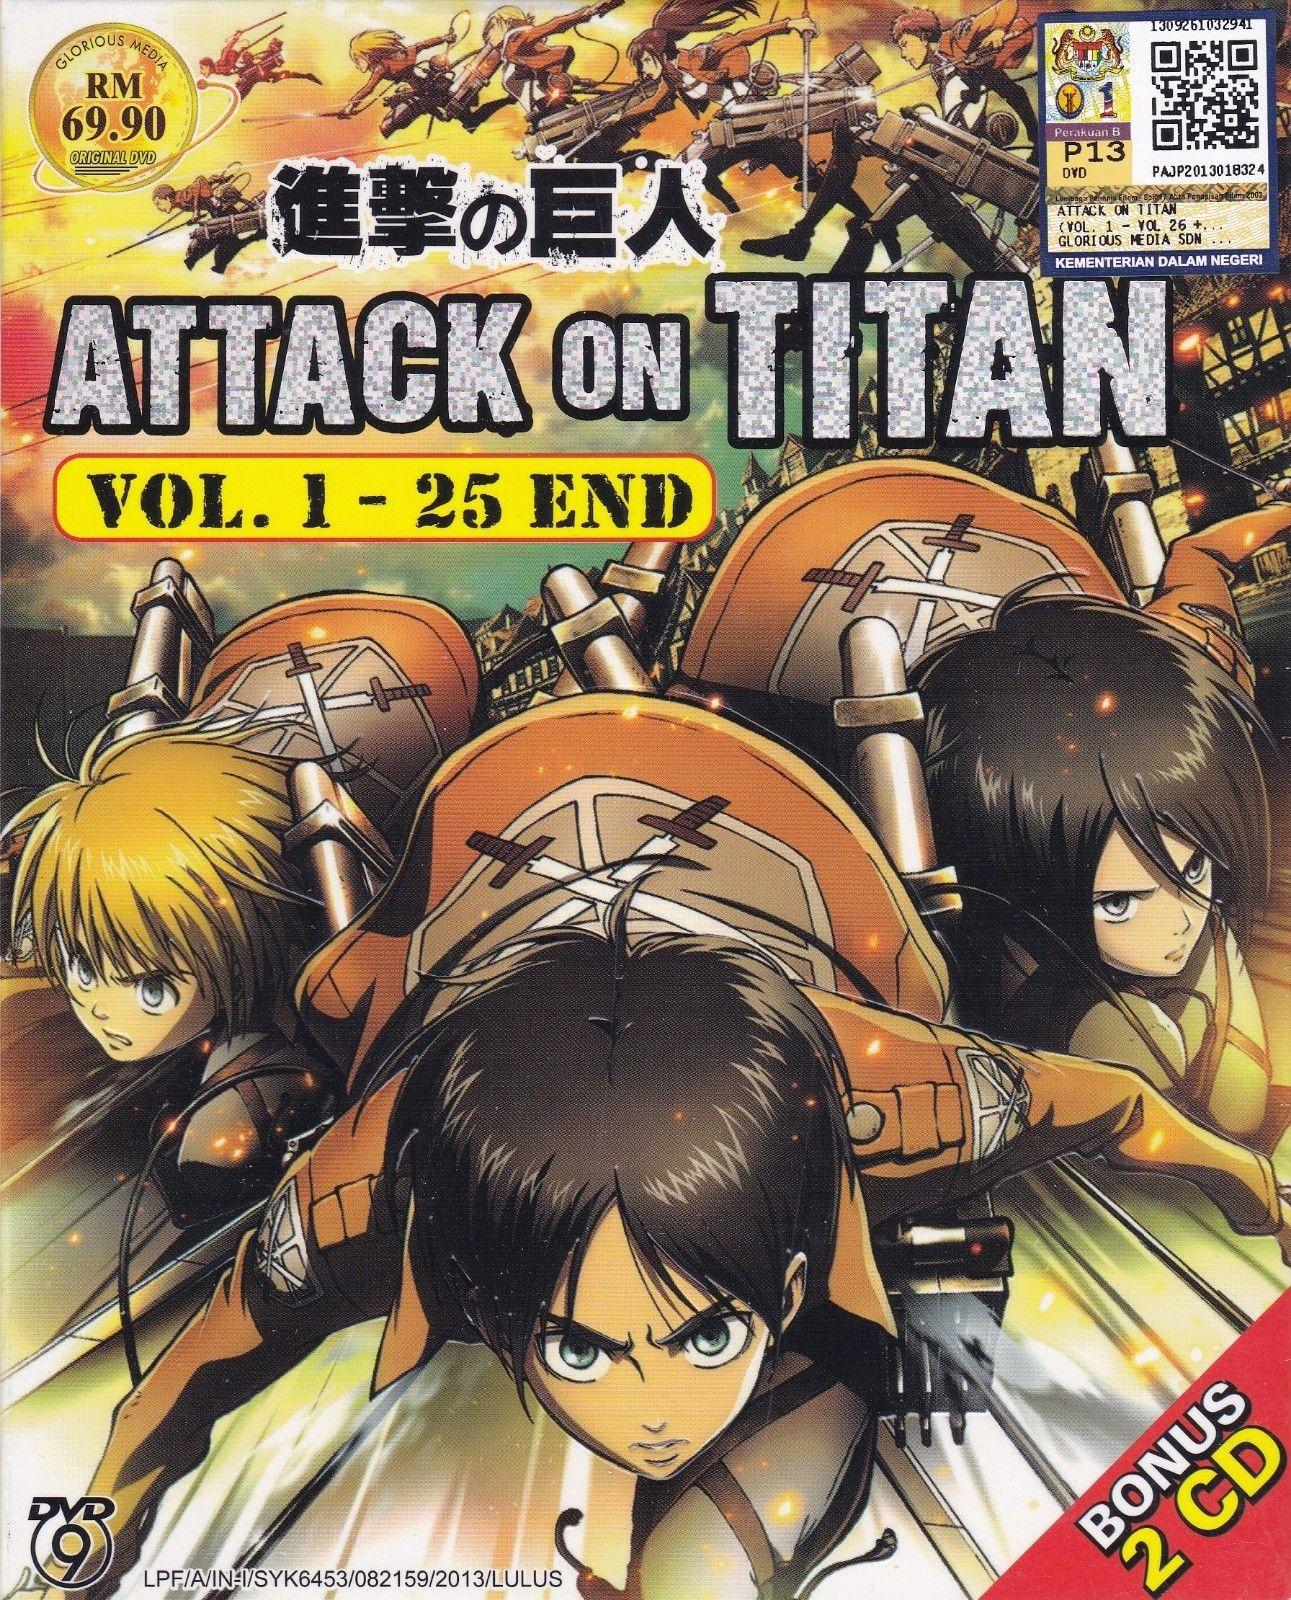 DVD ANIME ATTACK ON TITAN Vol.1-25 End 3DVD NTSC Region